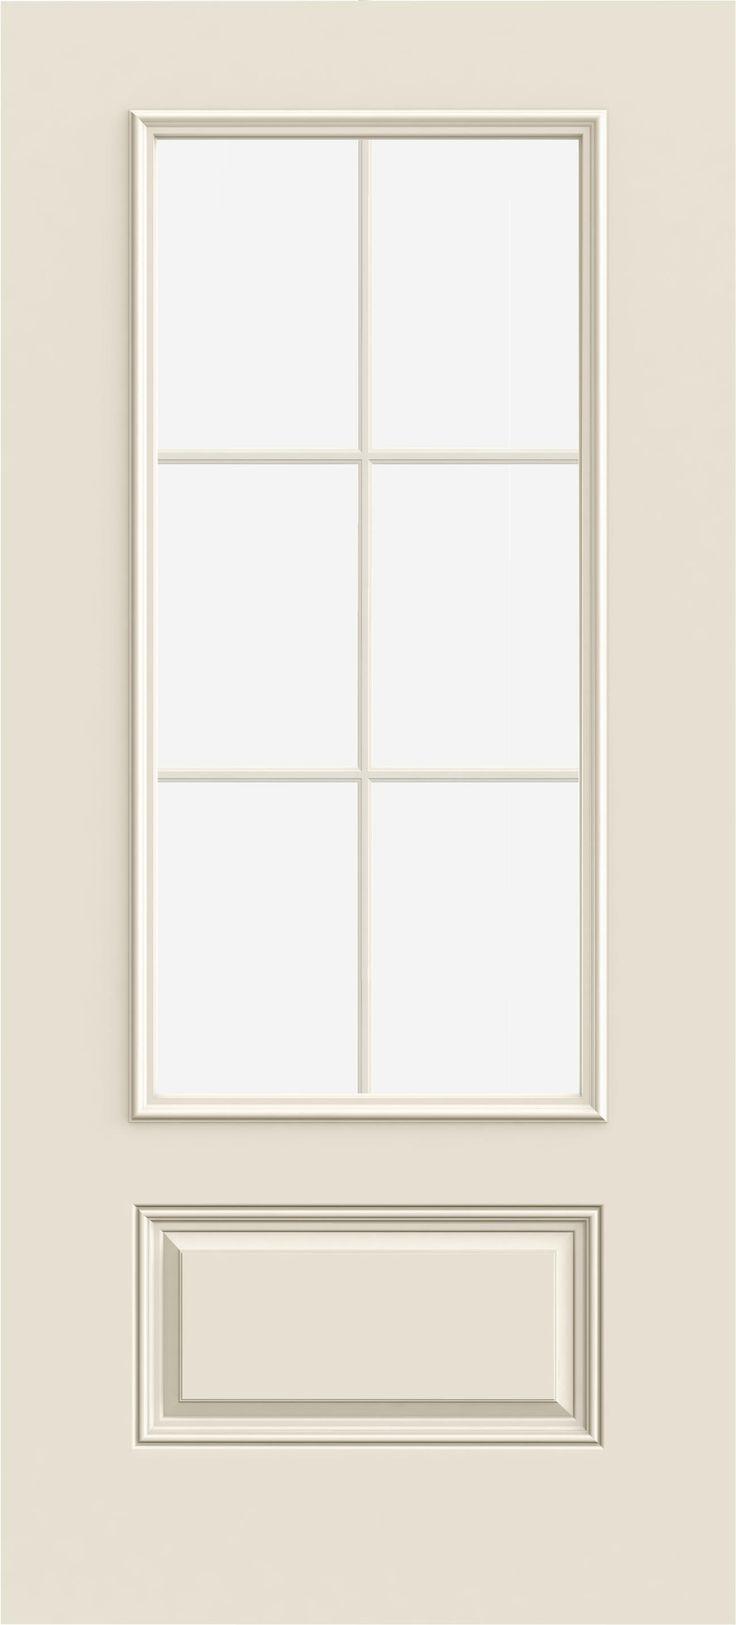 Best 25 exterior glass doors ideas on pinterest for Exterior glass panel design